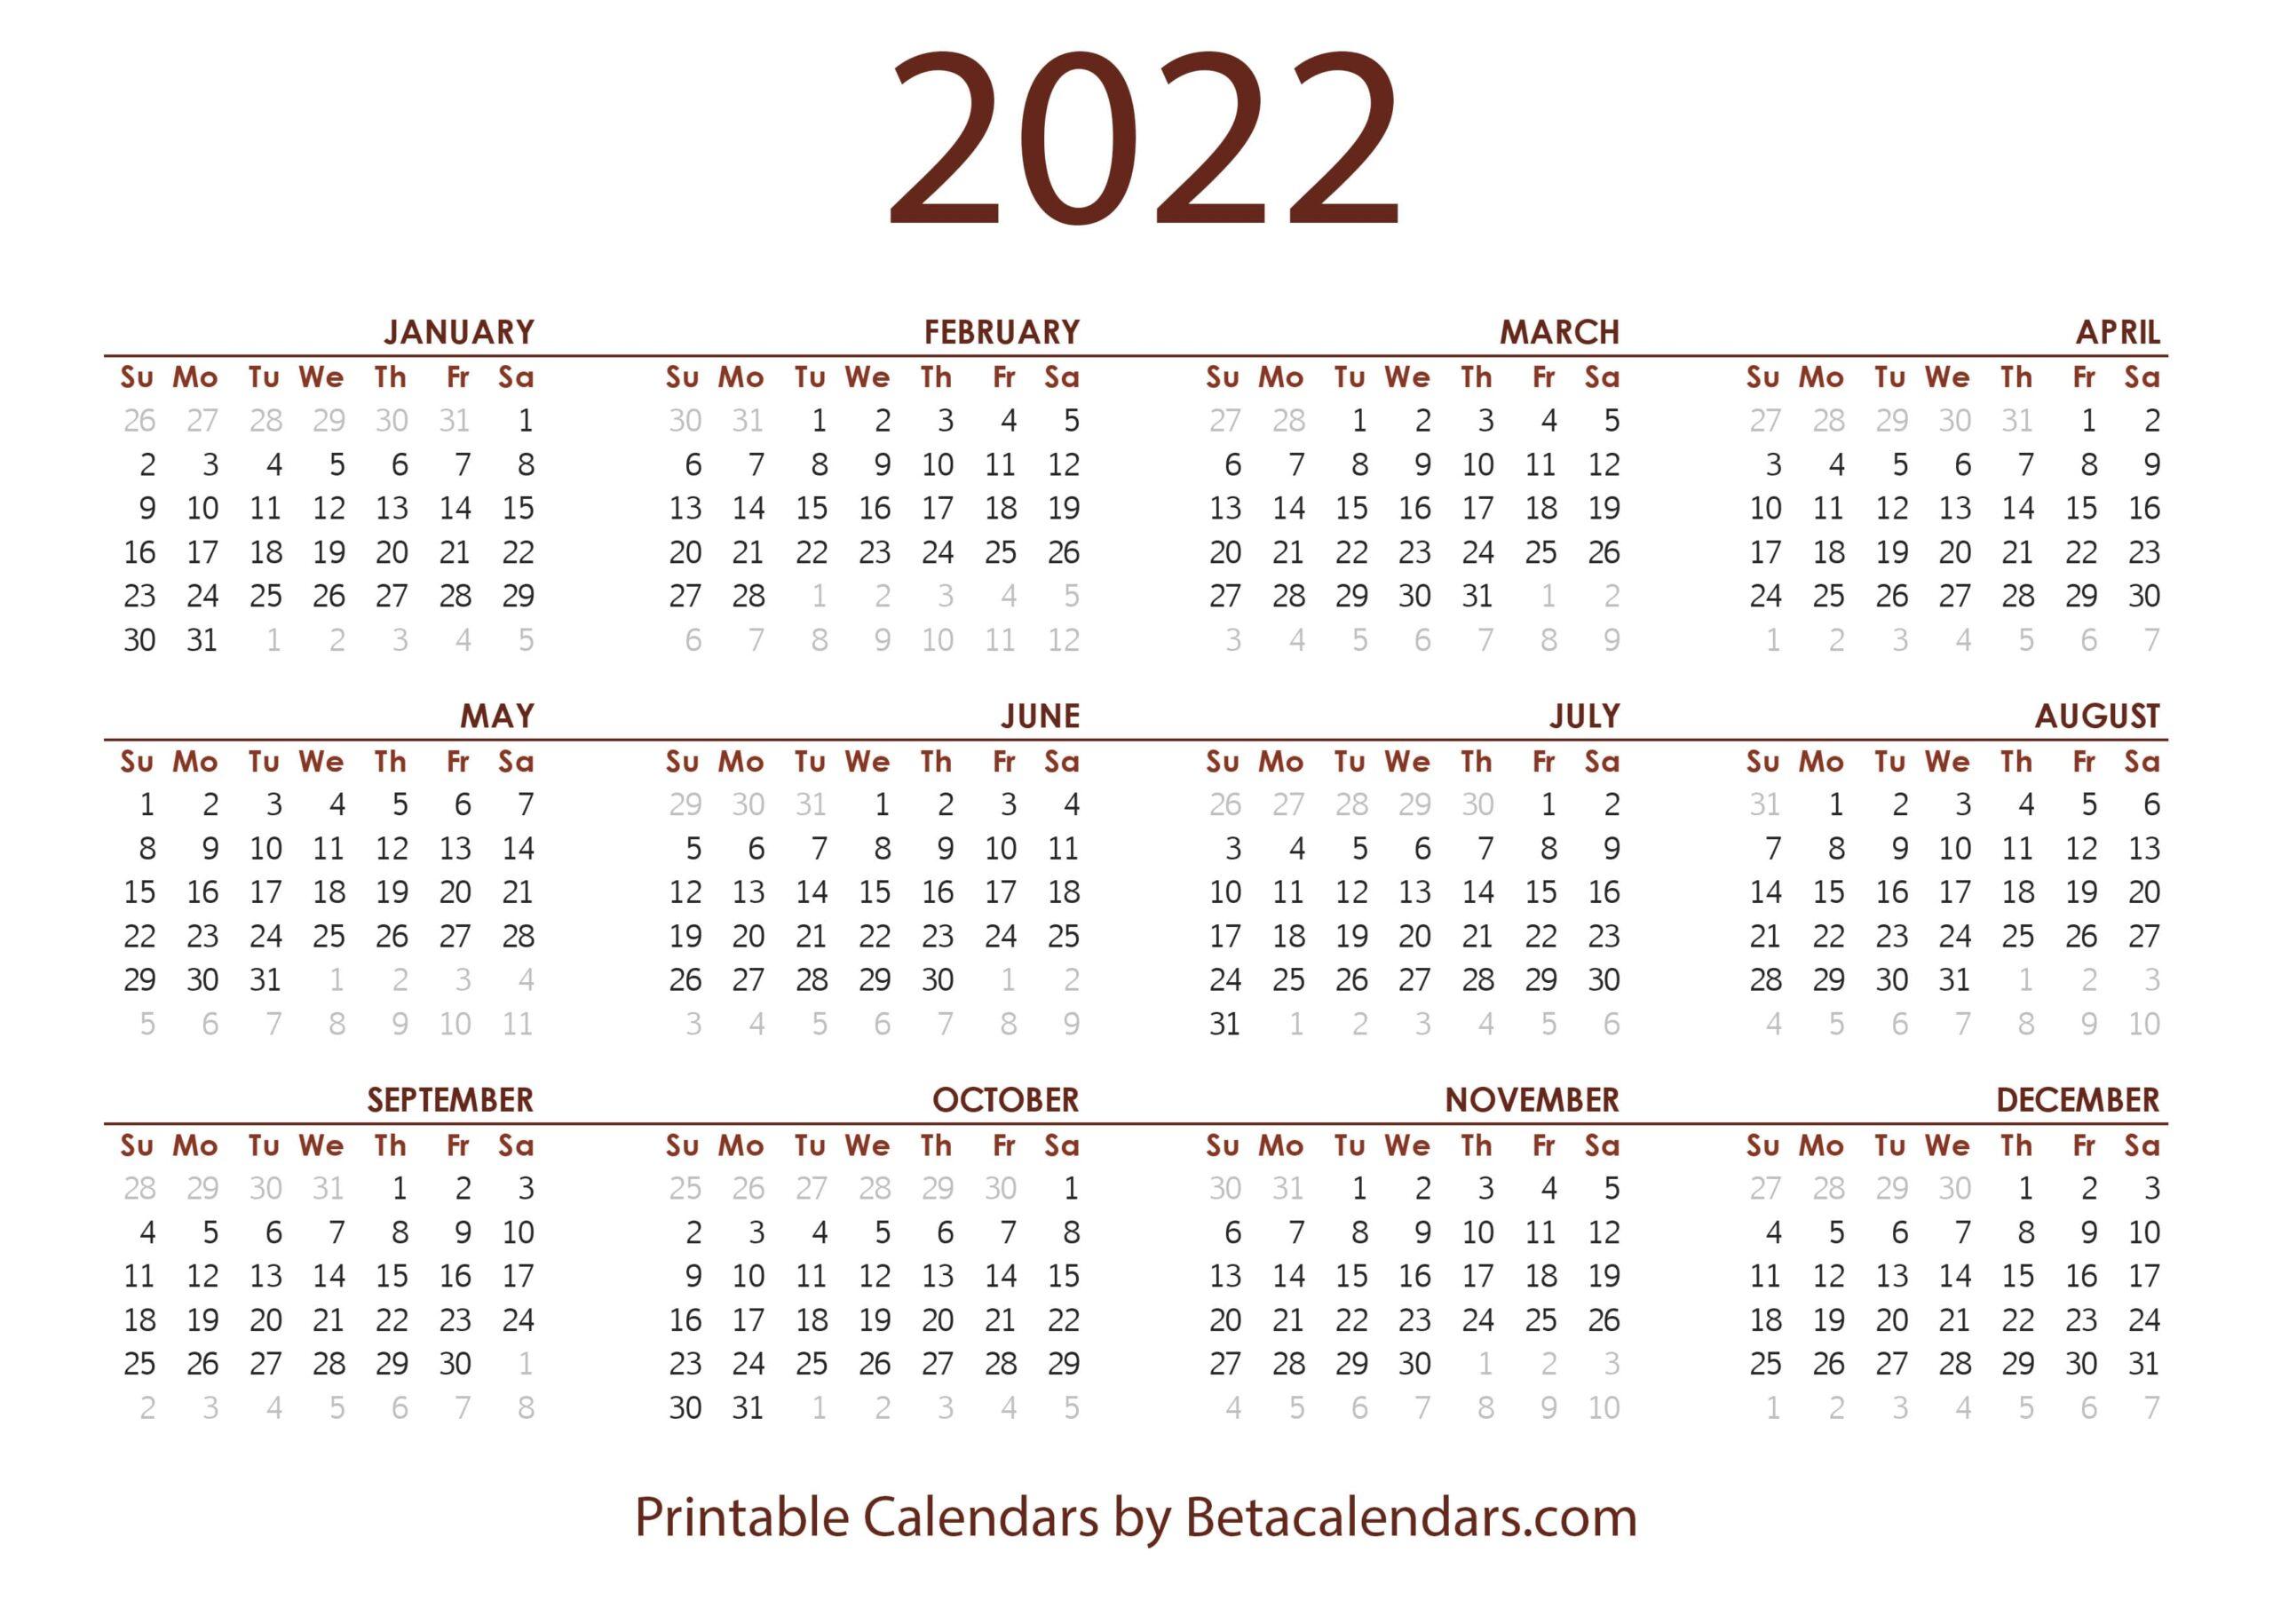 2022 2023 Calendar.2022 Calendar Beta Calendars